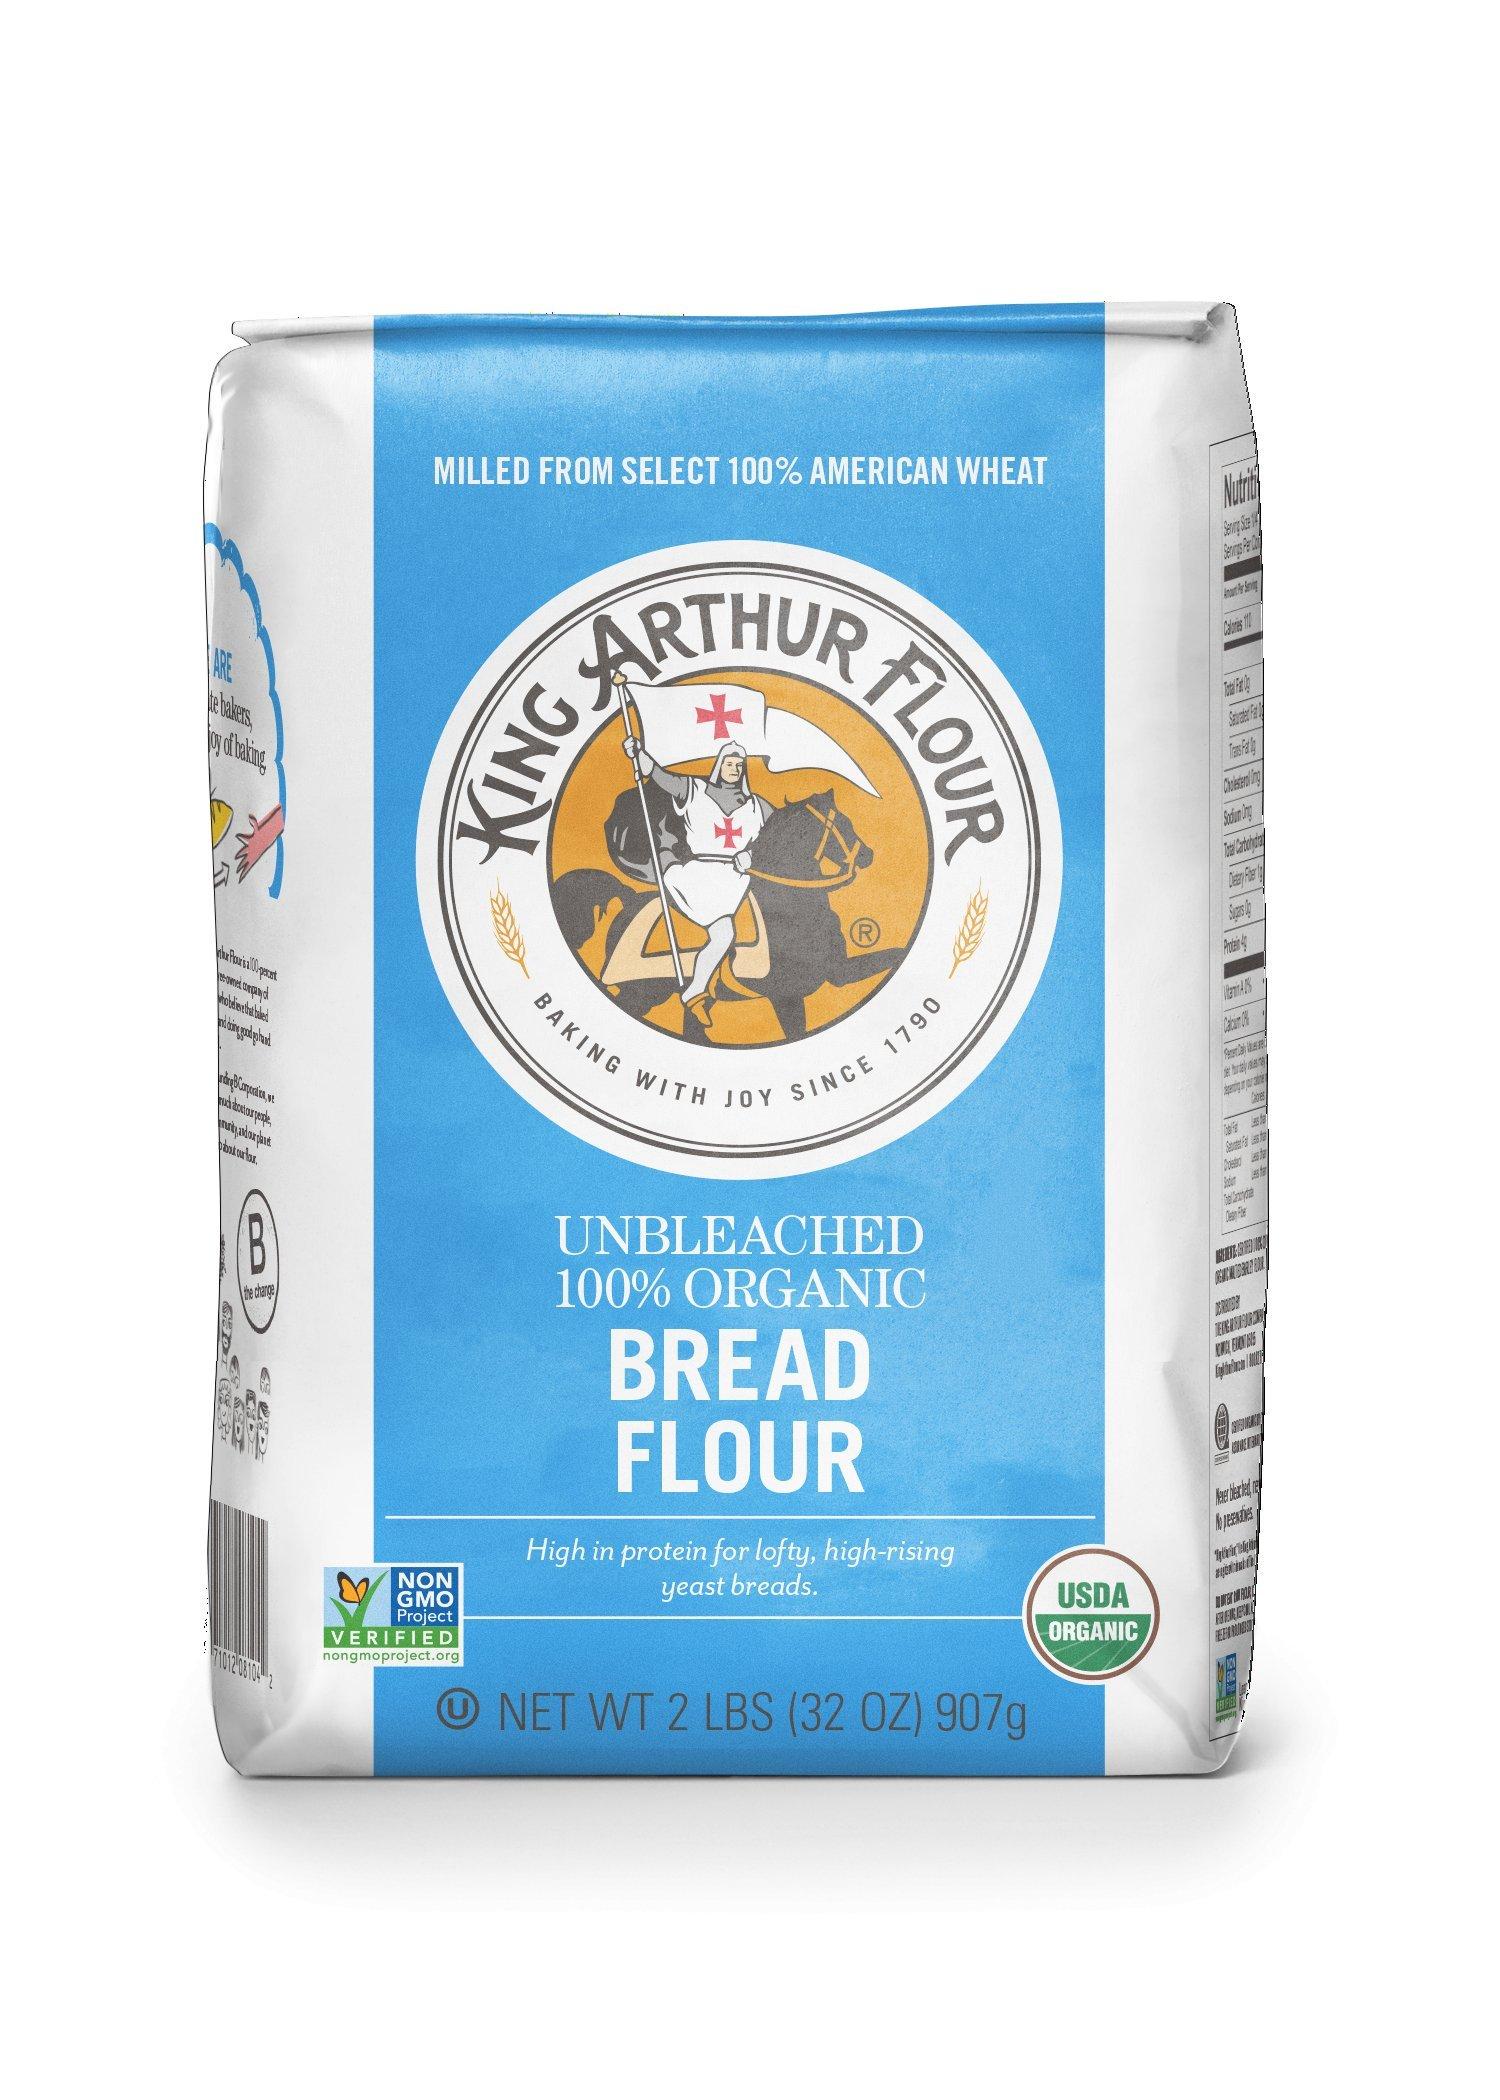 King Arthur Flour 100% Organic Bread Flour , 2 Pound (Pack of 12) by King Arthur Flour (Image #1)